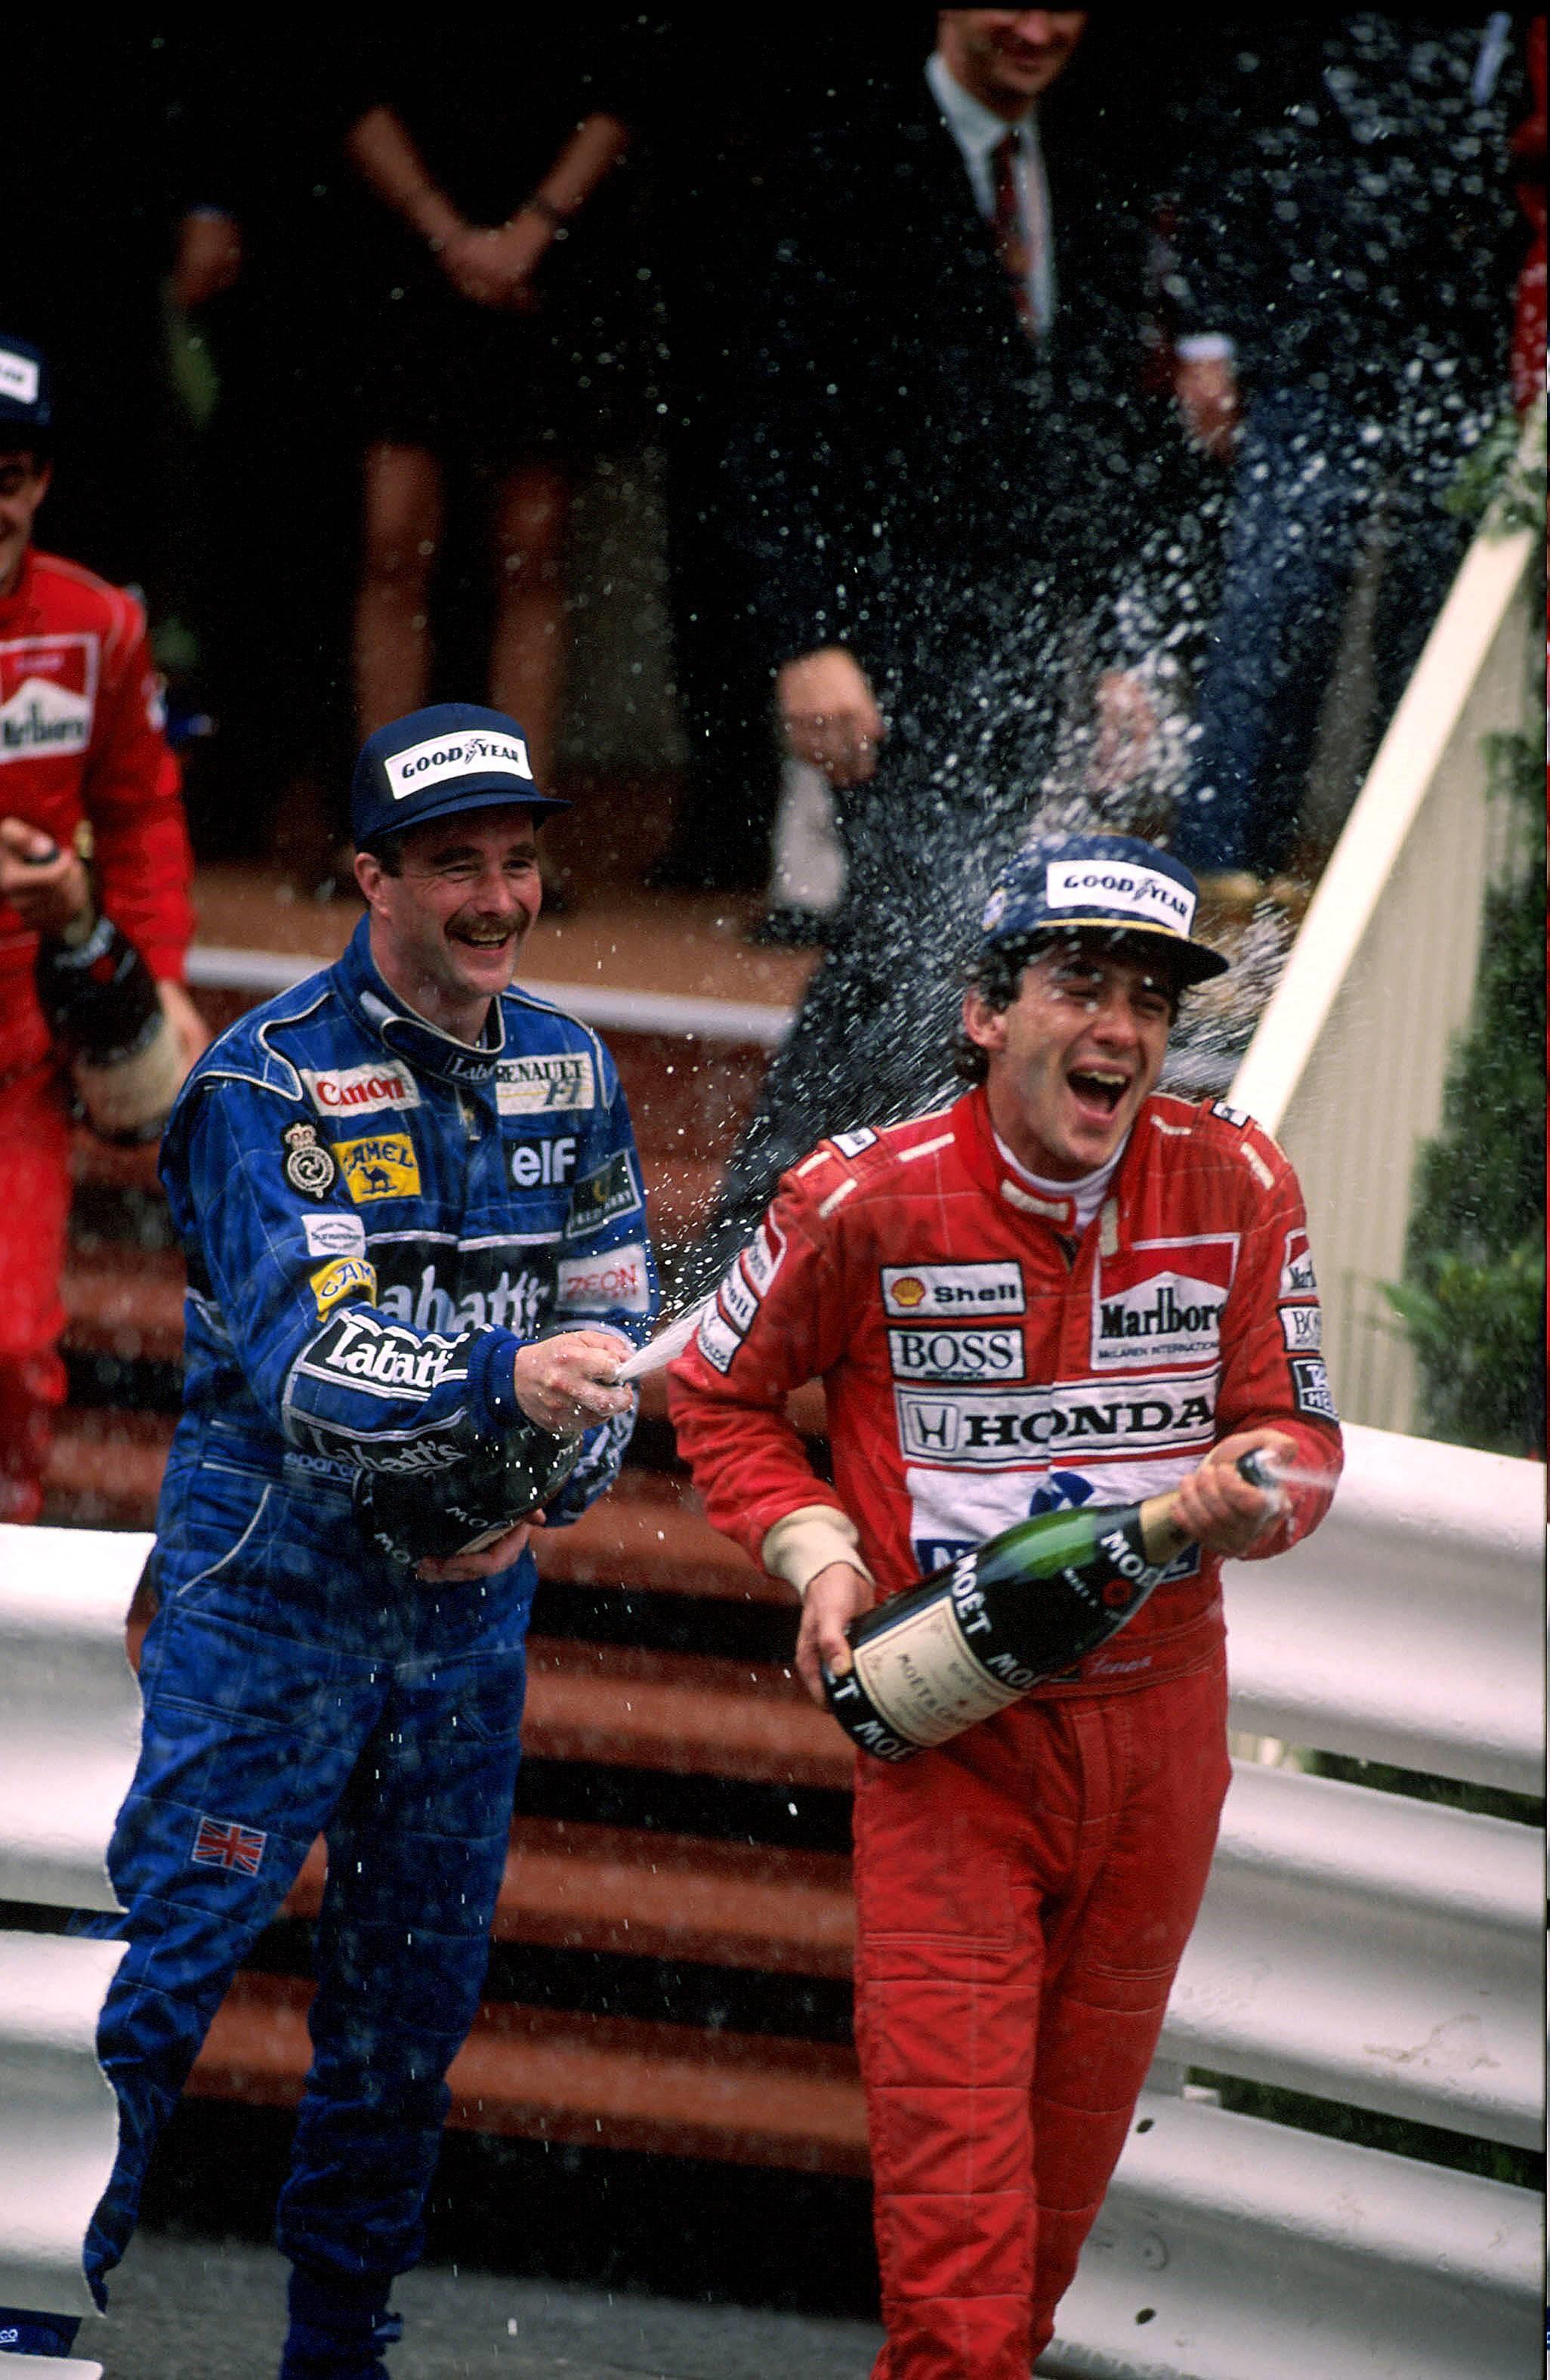 Nigel Mansell & Ayrton Senna - 1992 Monako Grand Prix